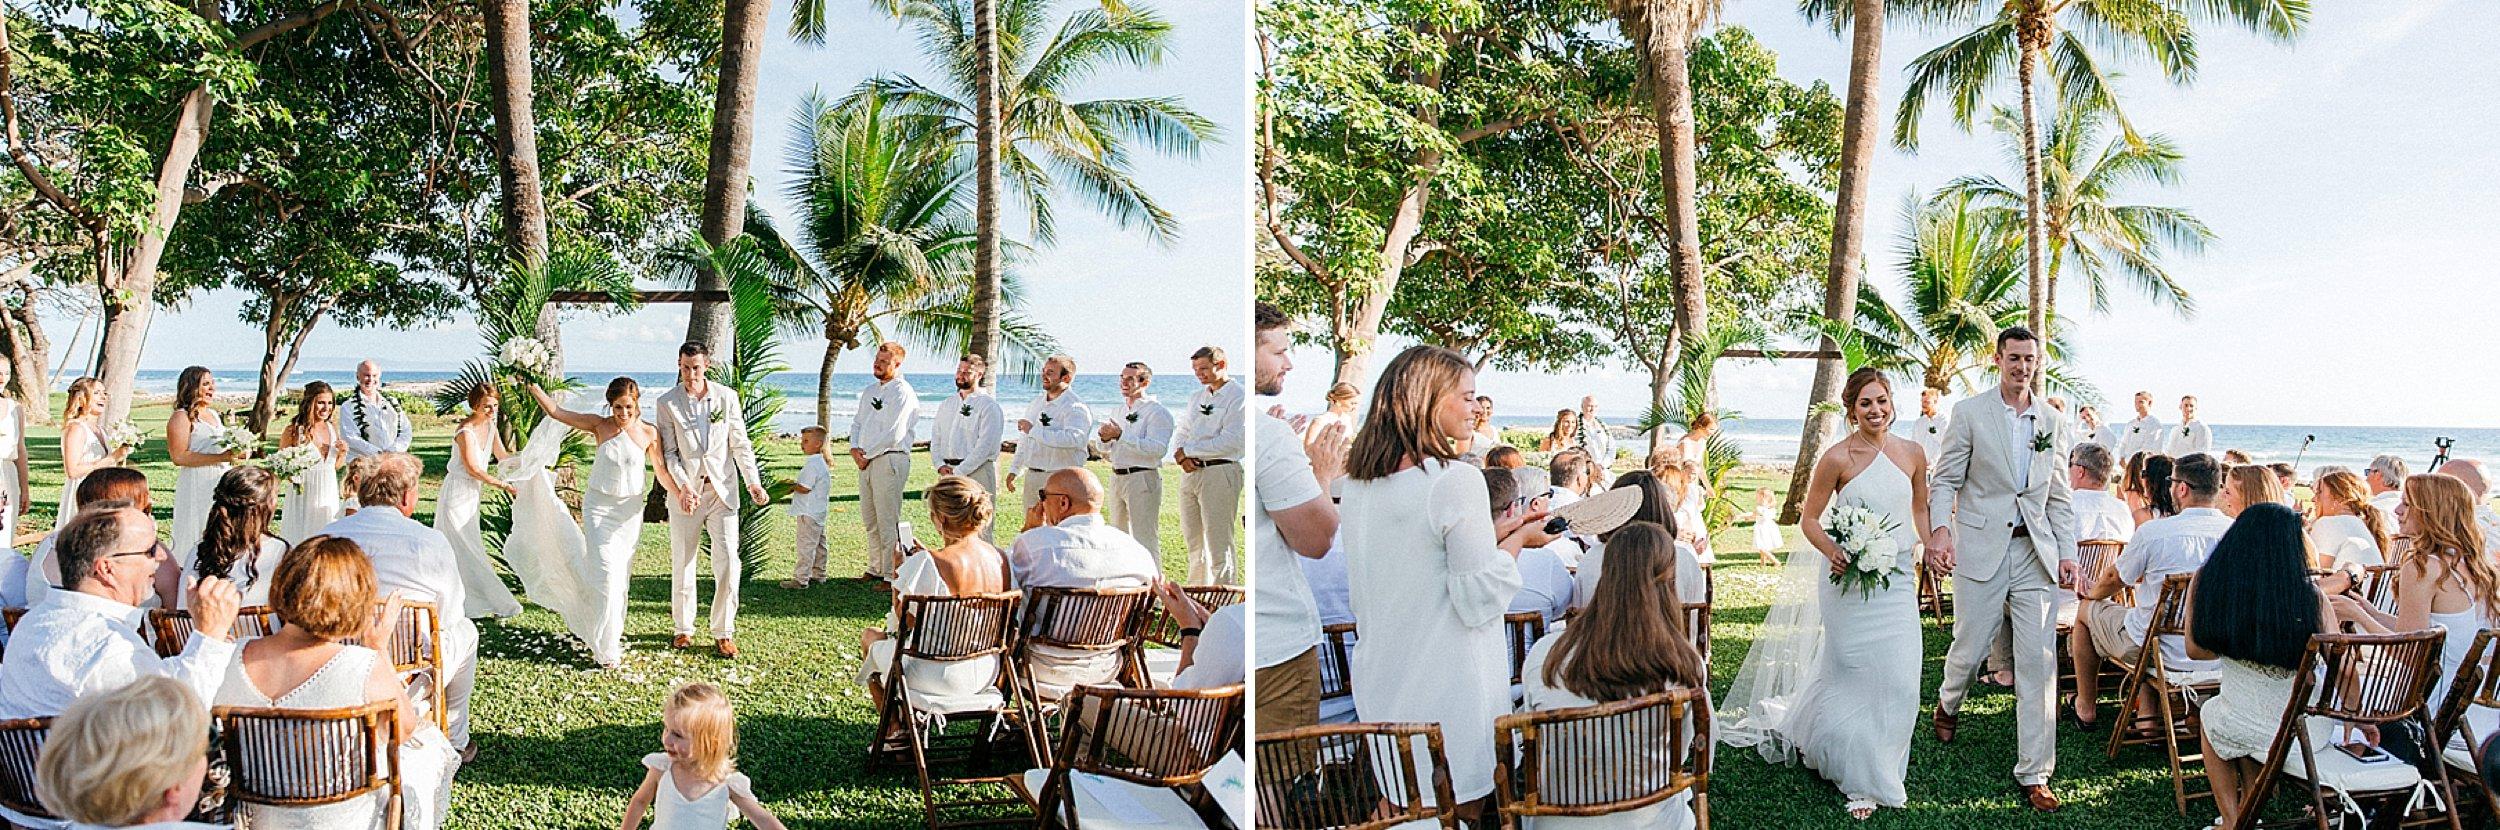 maui-wedding-at-olowalu-plantation-house_0072.jpg